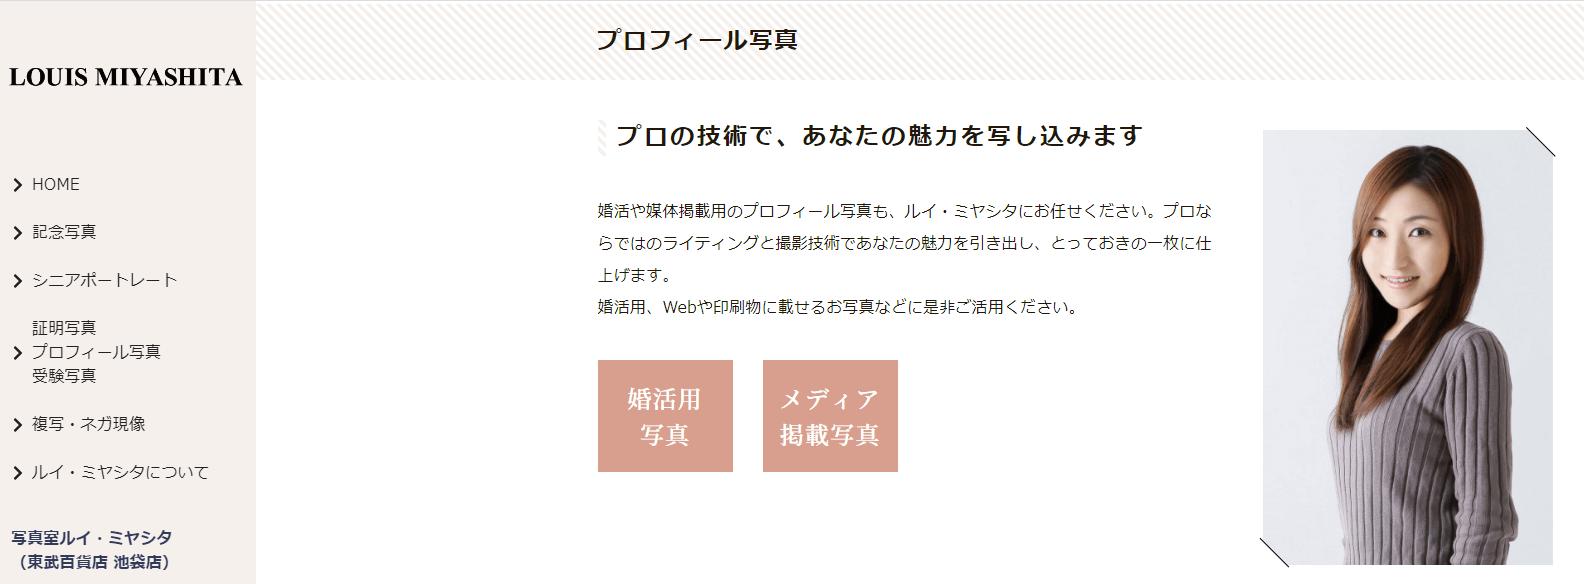 ikebukuro-tobu-photo